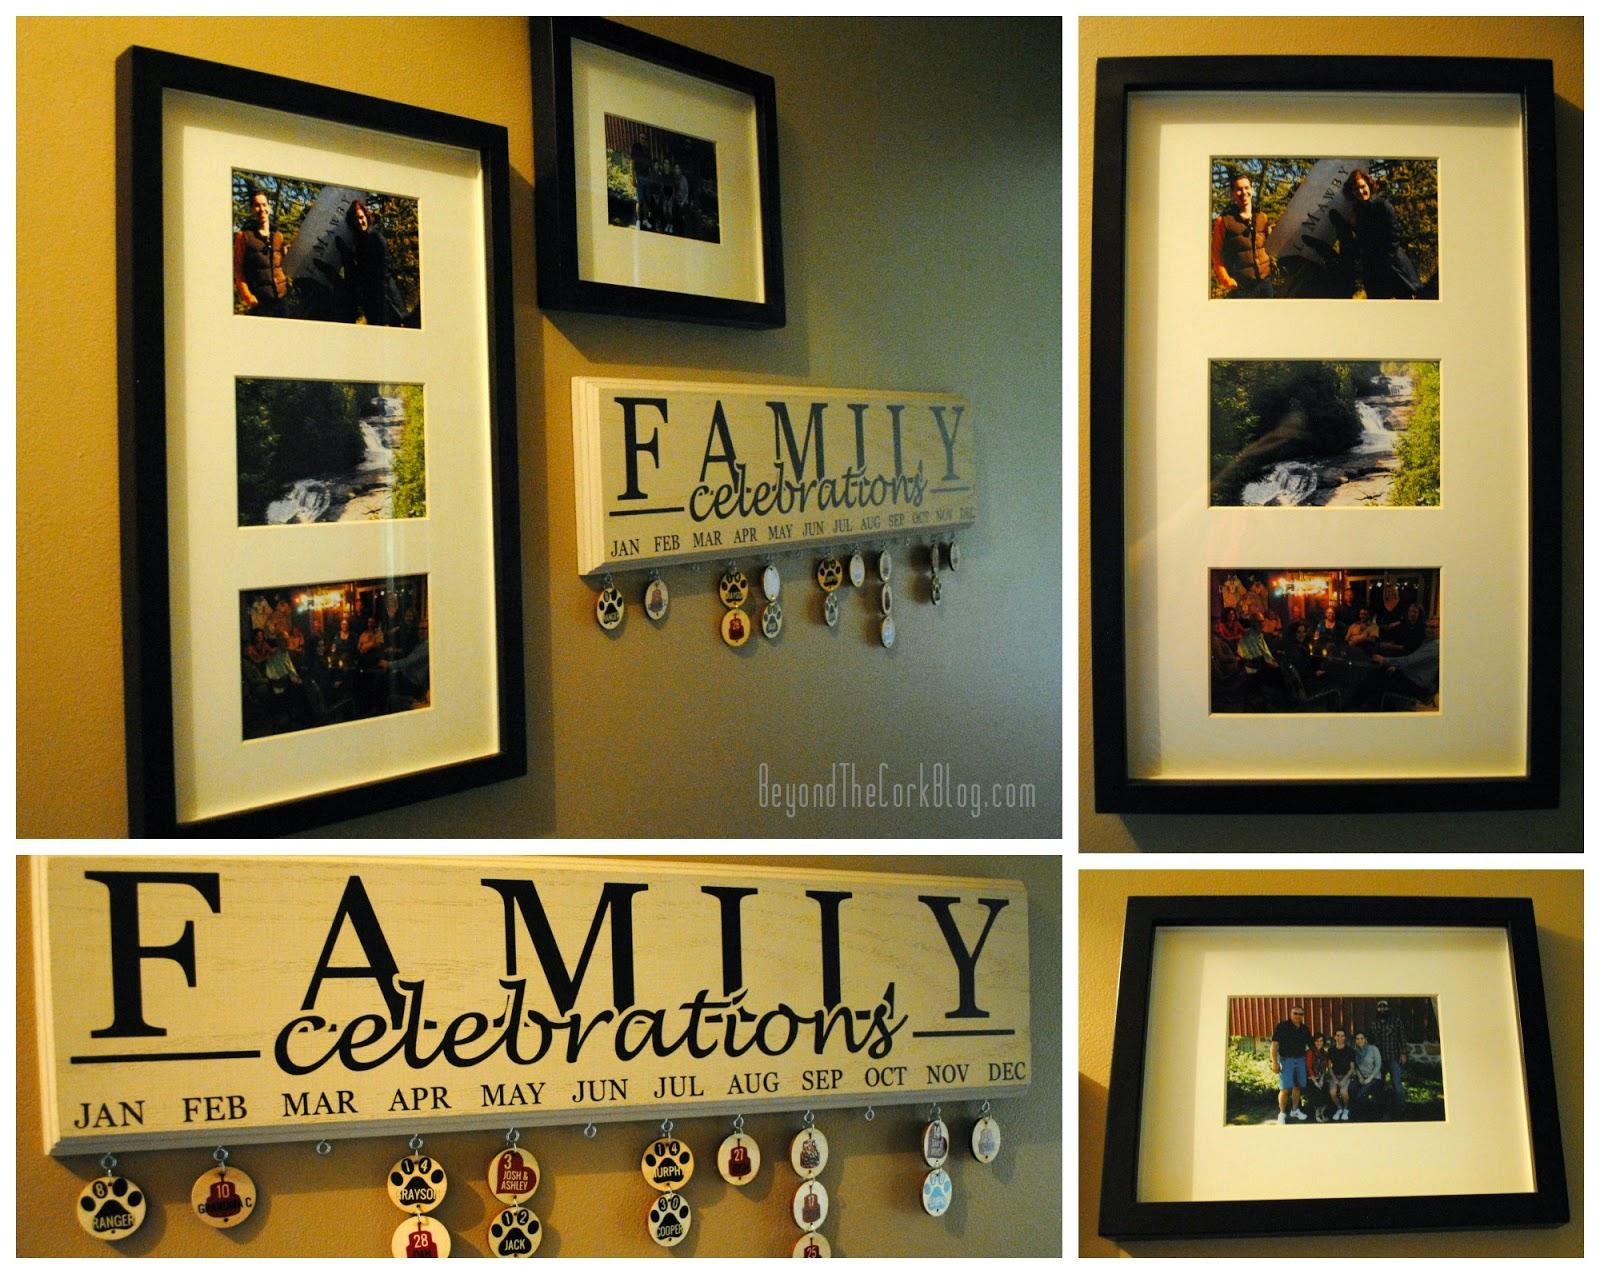 Family Celebrations Plaque Family Celebrations Plaque